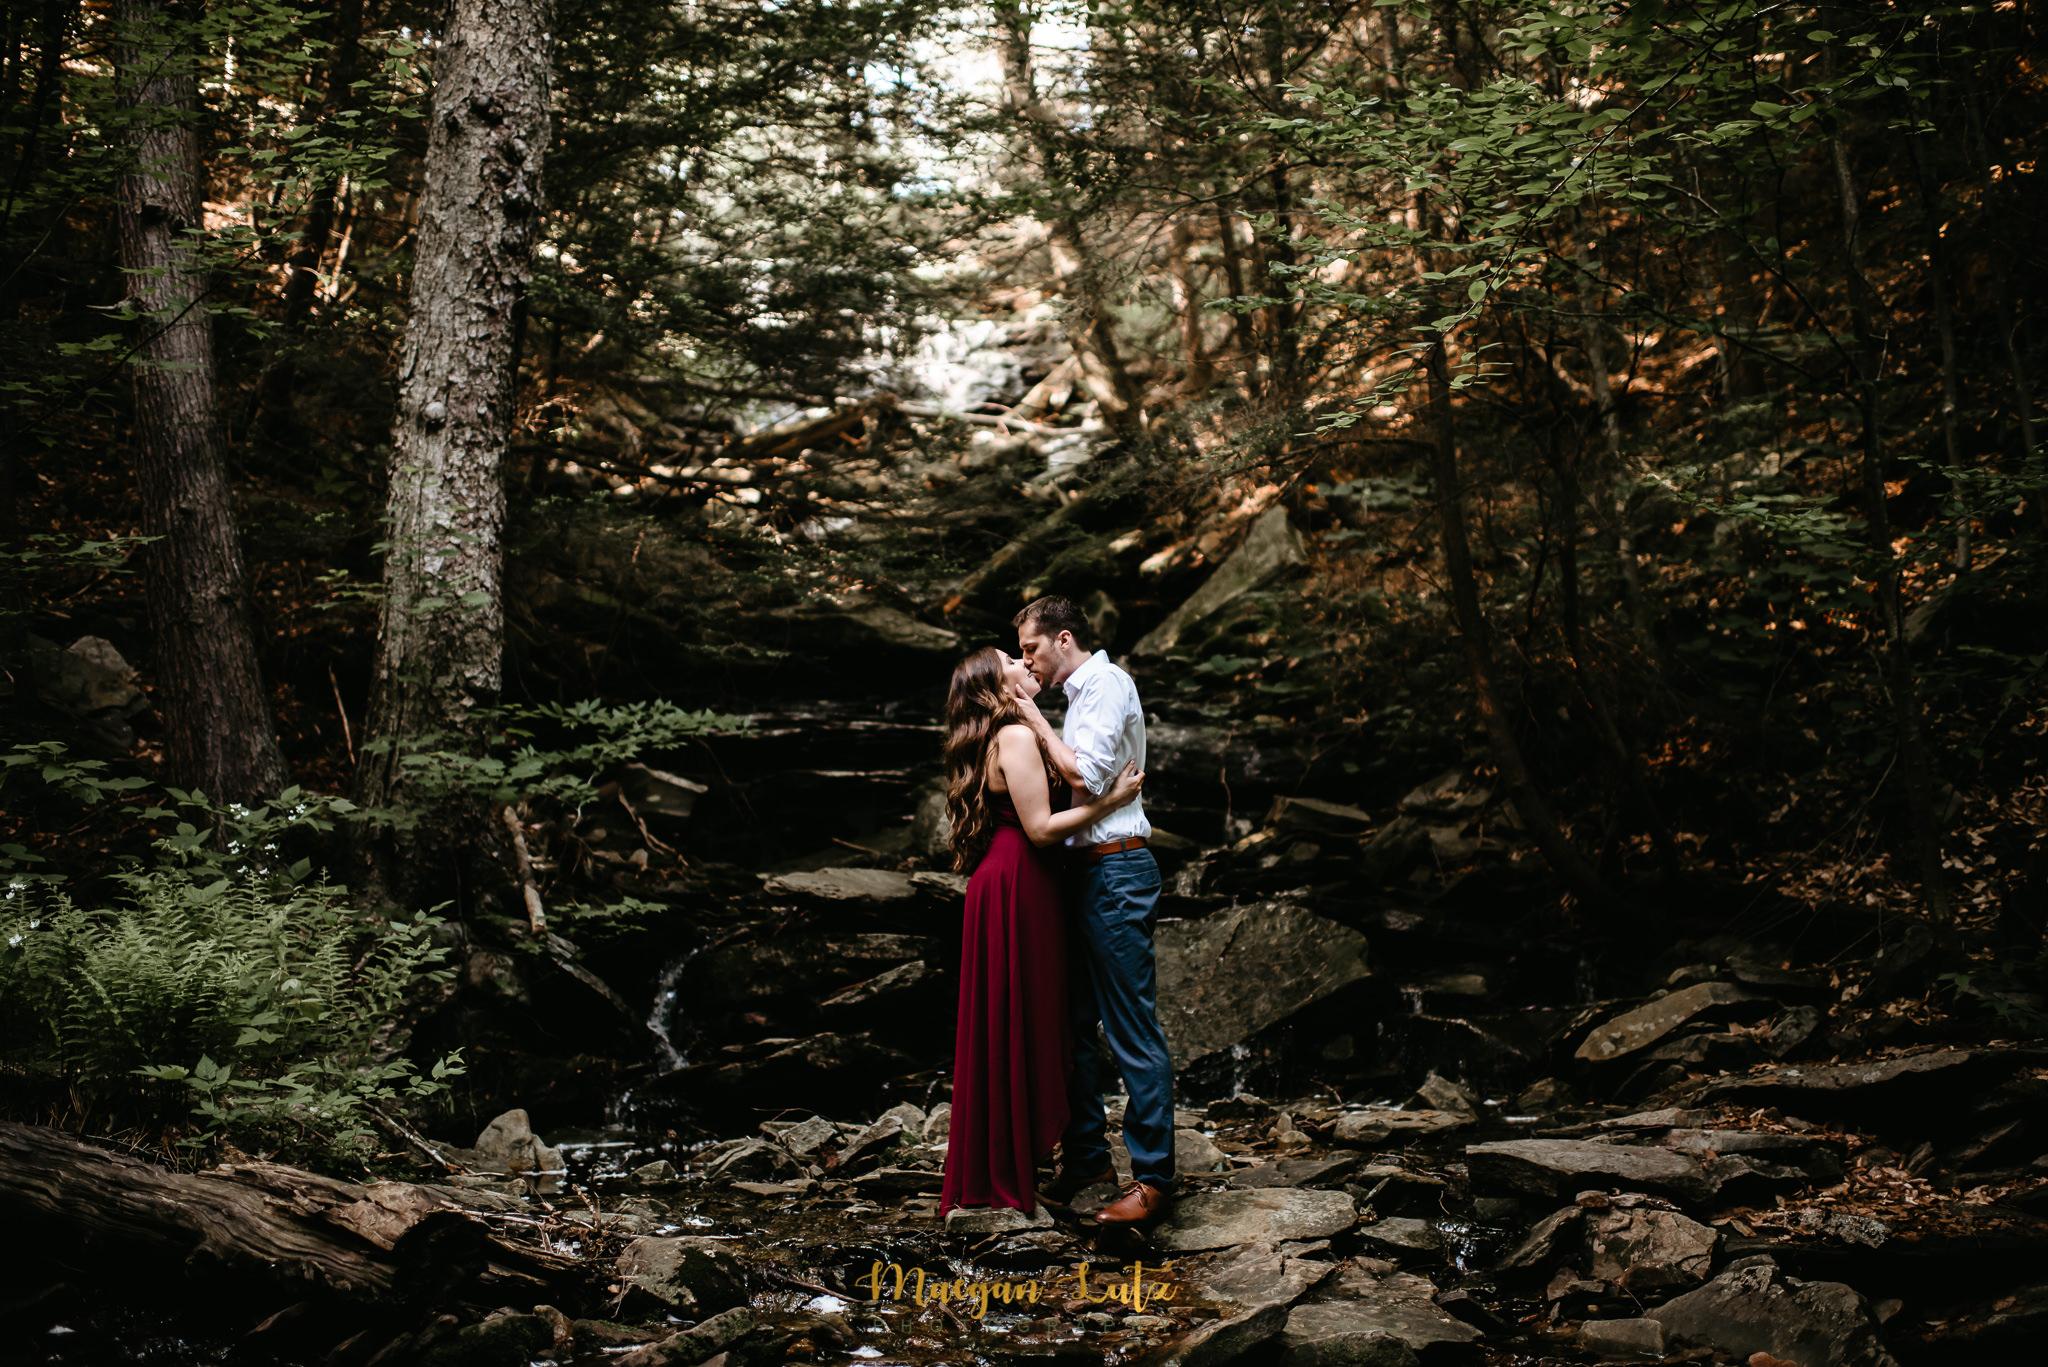 NEPA-Engagement-Wedding-Photographer-Session-at-Ricketts-Glen-State-Park-12.jpg